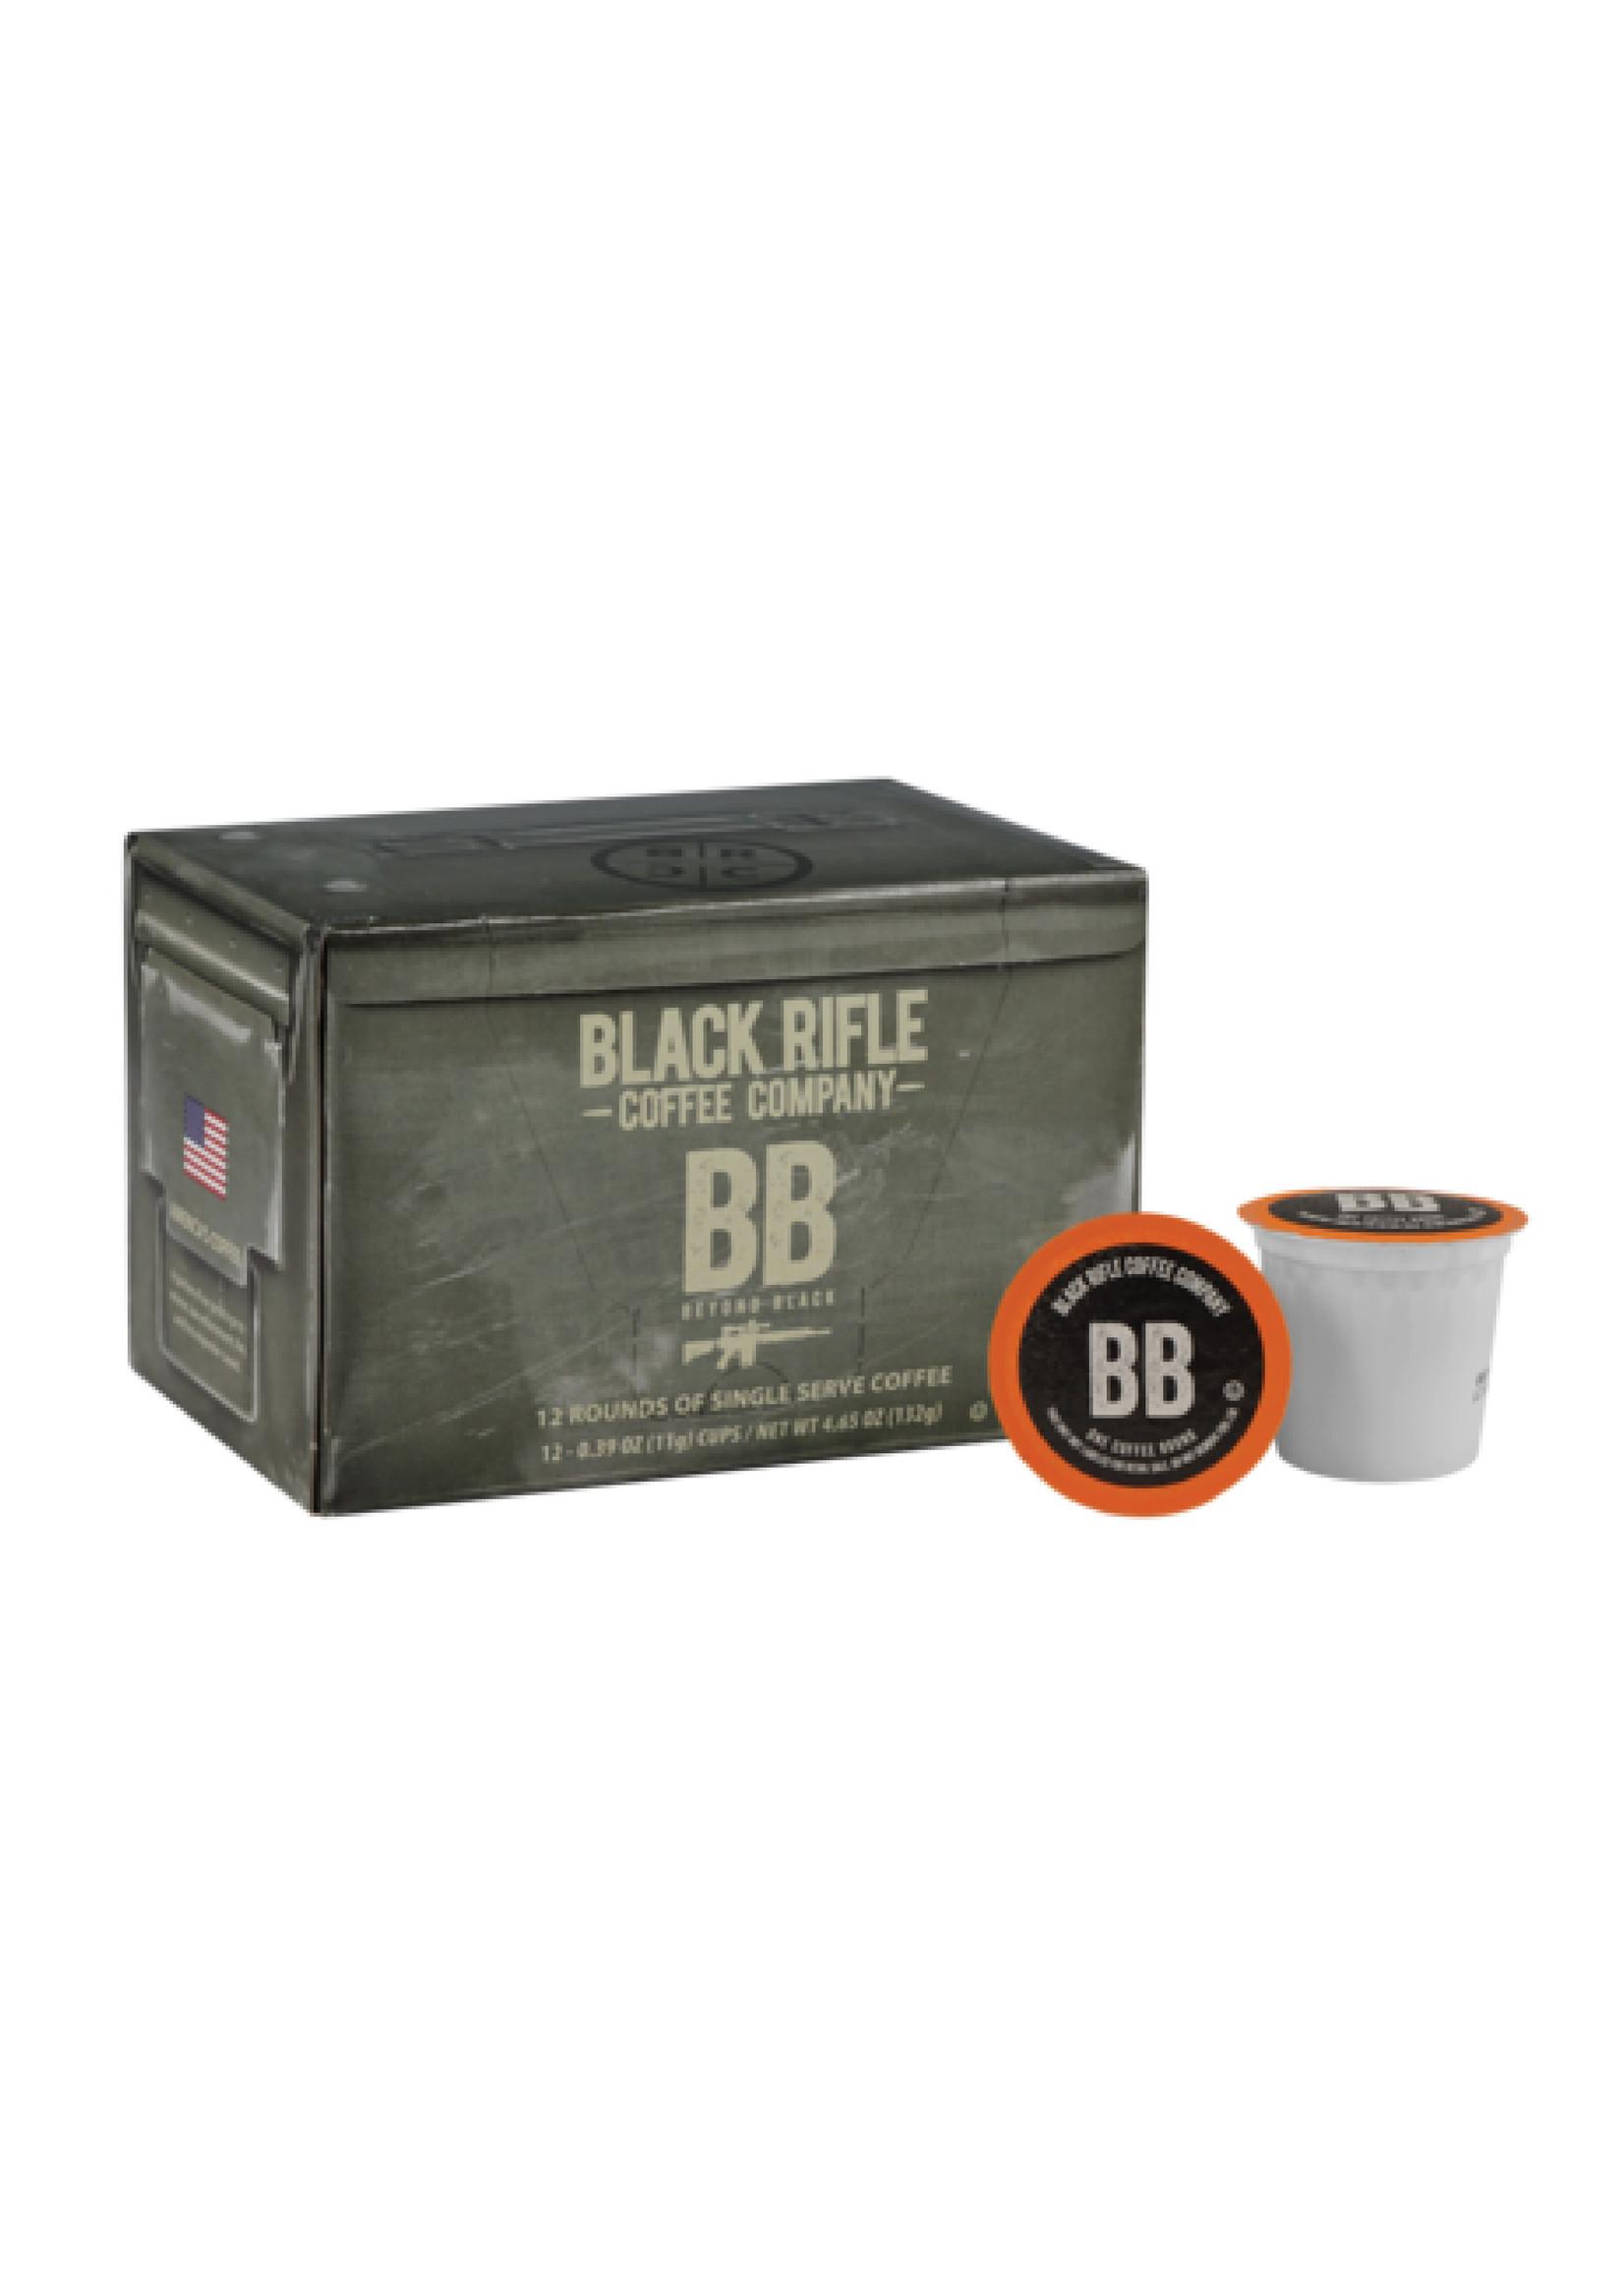 Black Rifle Coffee Company Black Rifle Coffee Company Beyond Black Coffee Rounds 12ct